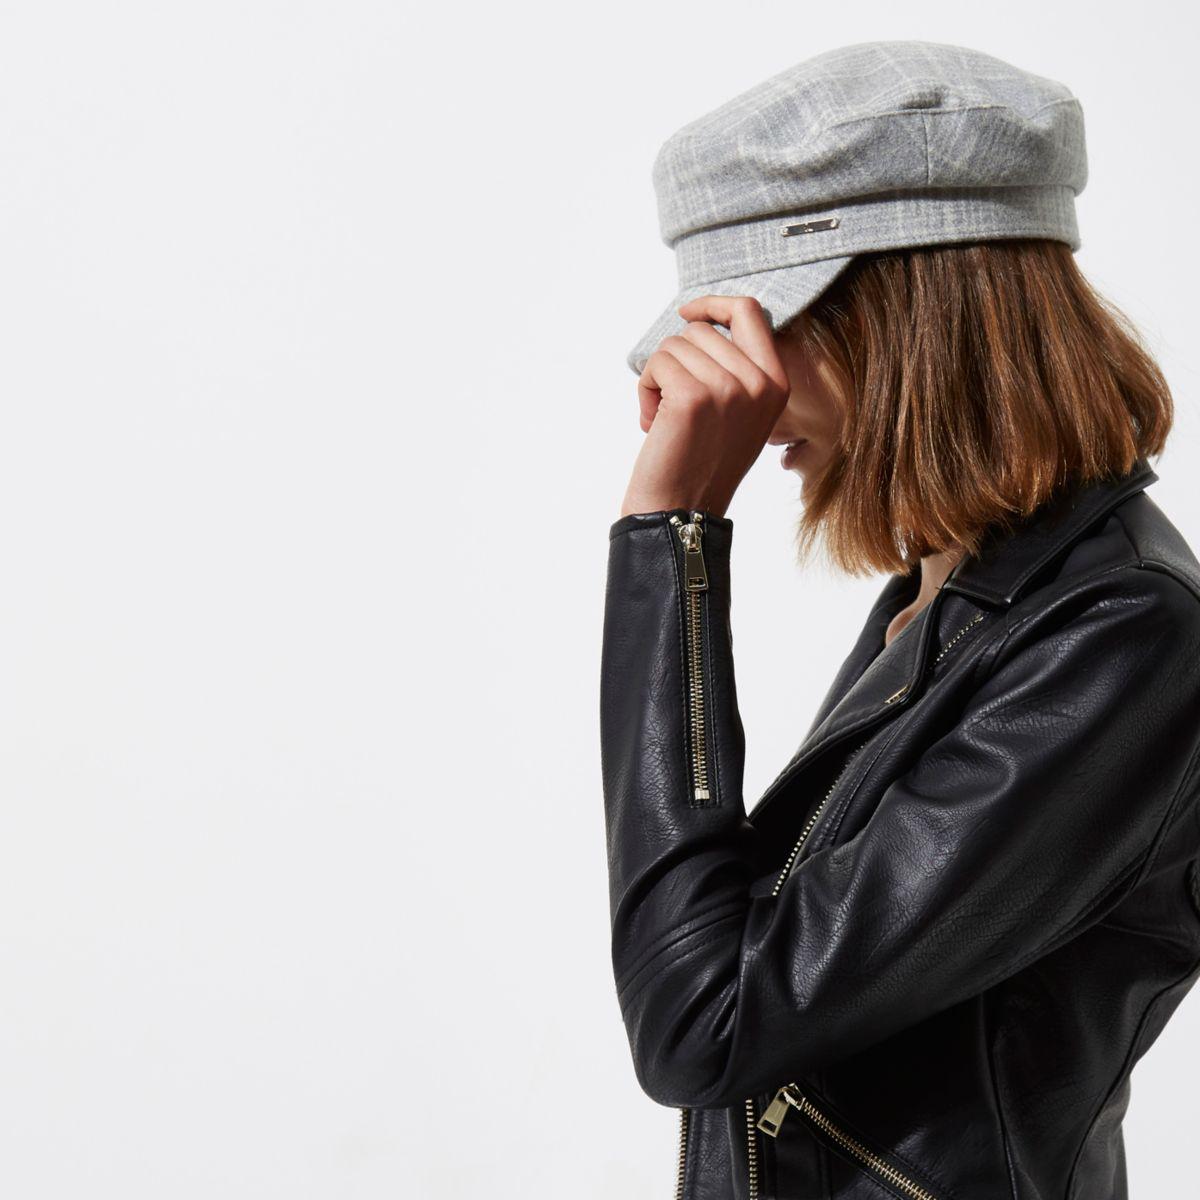 782869da River Island Grey Herringbone Check Baker Boy Hat in Gray - Lyst